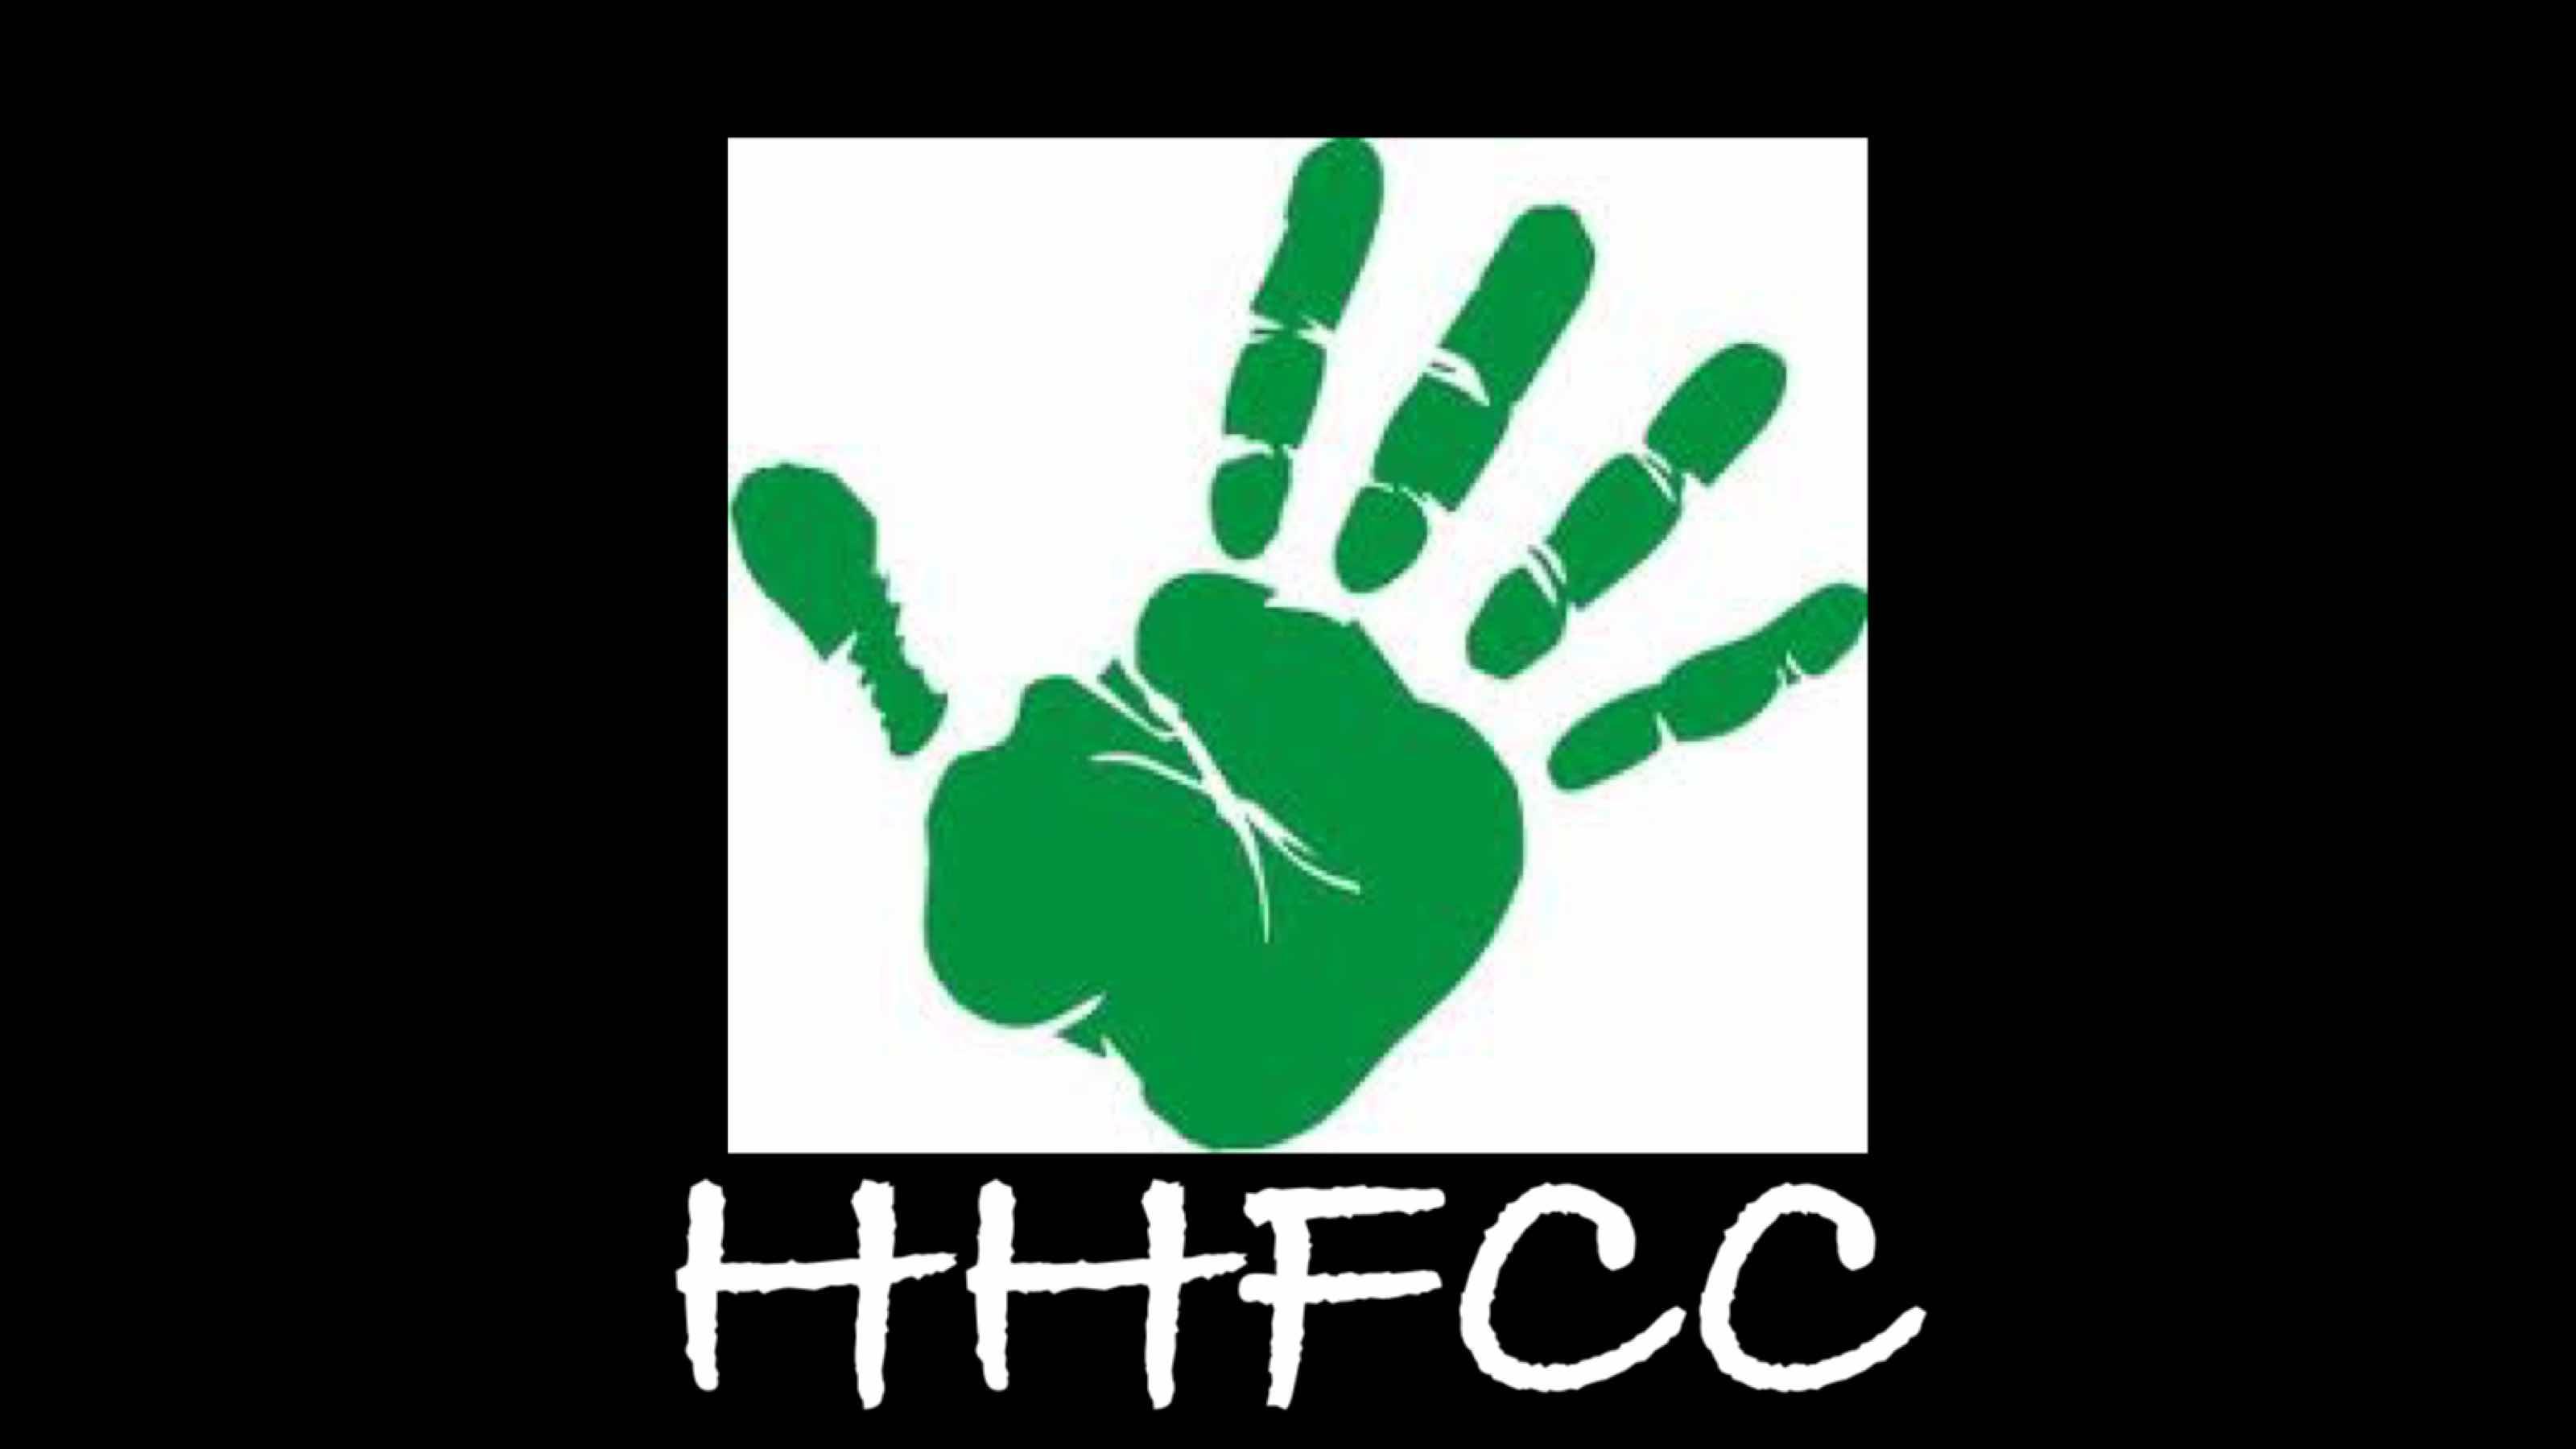 HHFCC